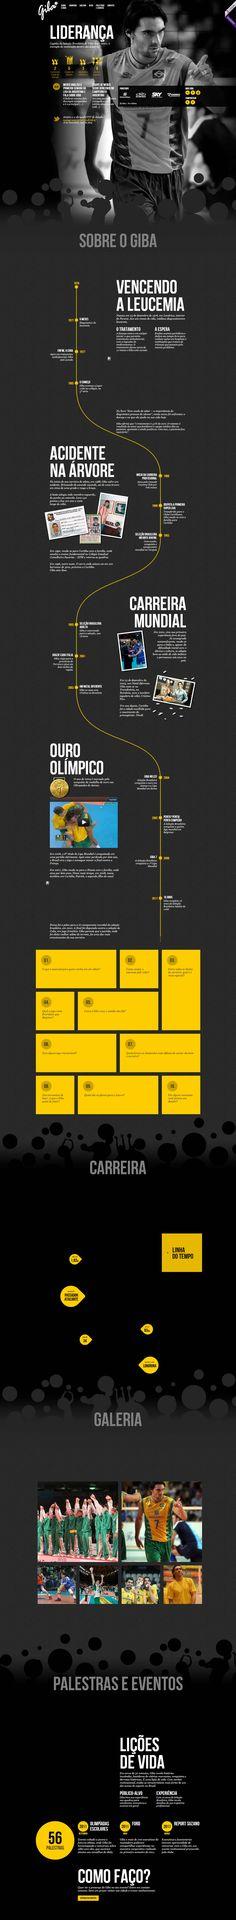 Unique Web Design, Giba 7 #webdesign #design (http://www.pinterest.com/aldenchong/)